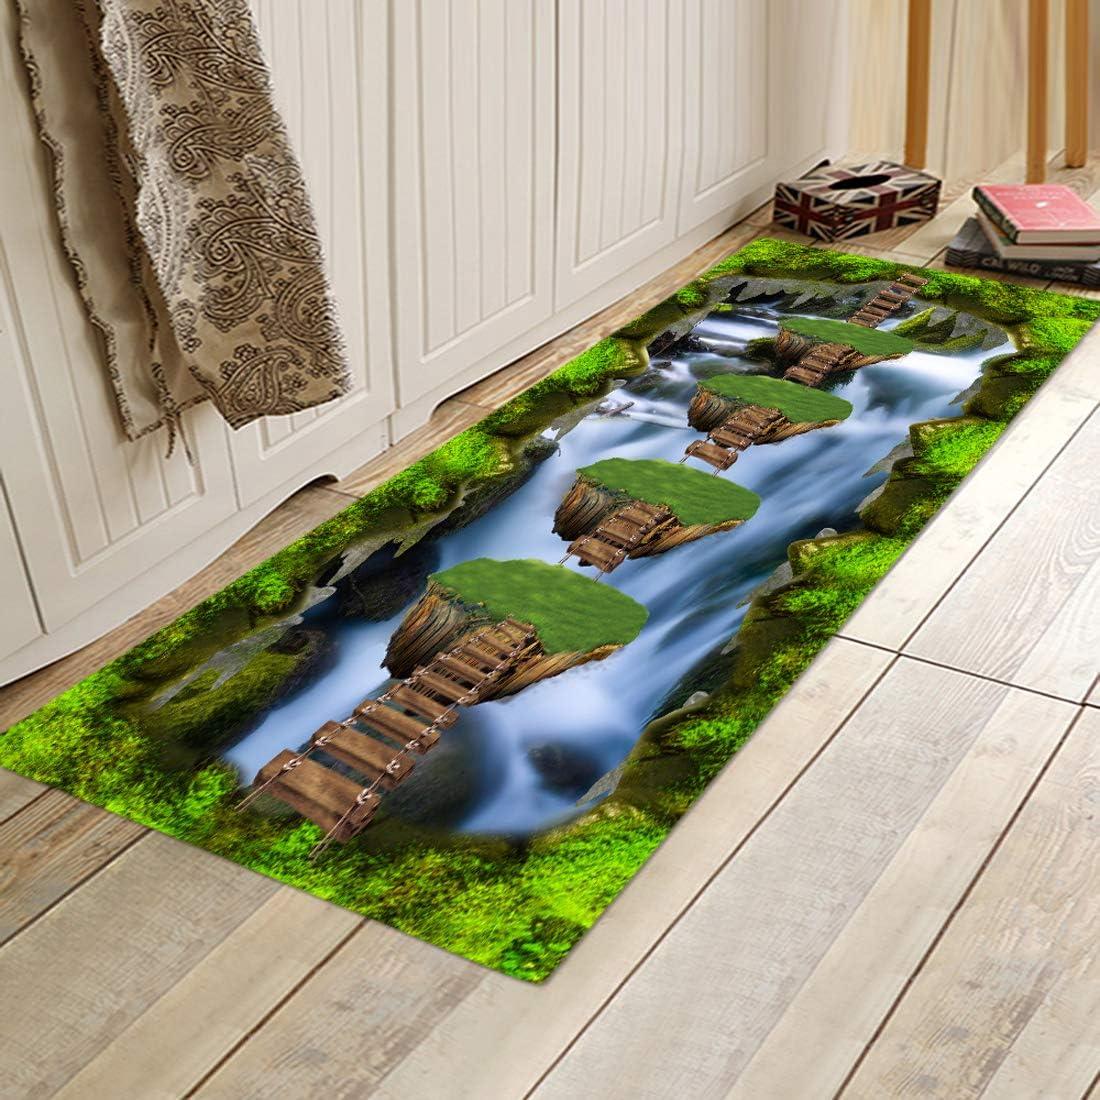 3D Optical Illusion Cheap bargain Rug,Non Slip Printing Carpet Max 86% OFF Mats Scenery